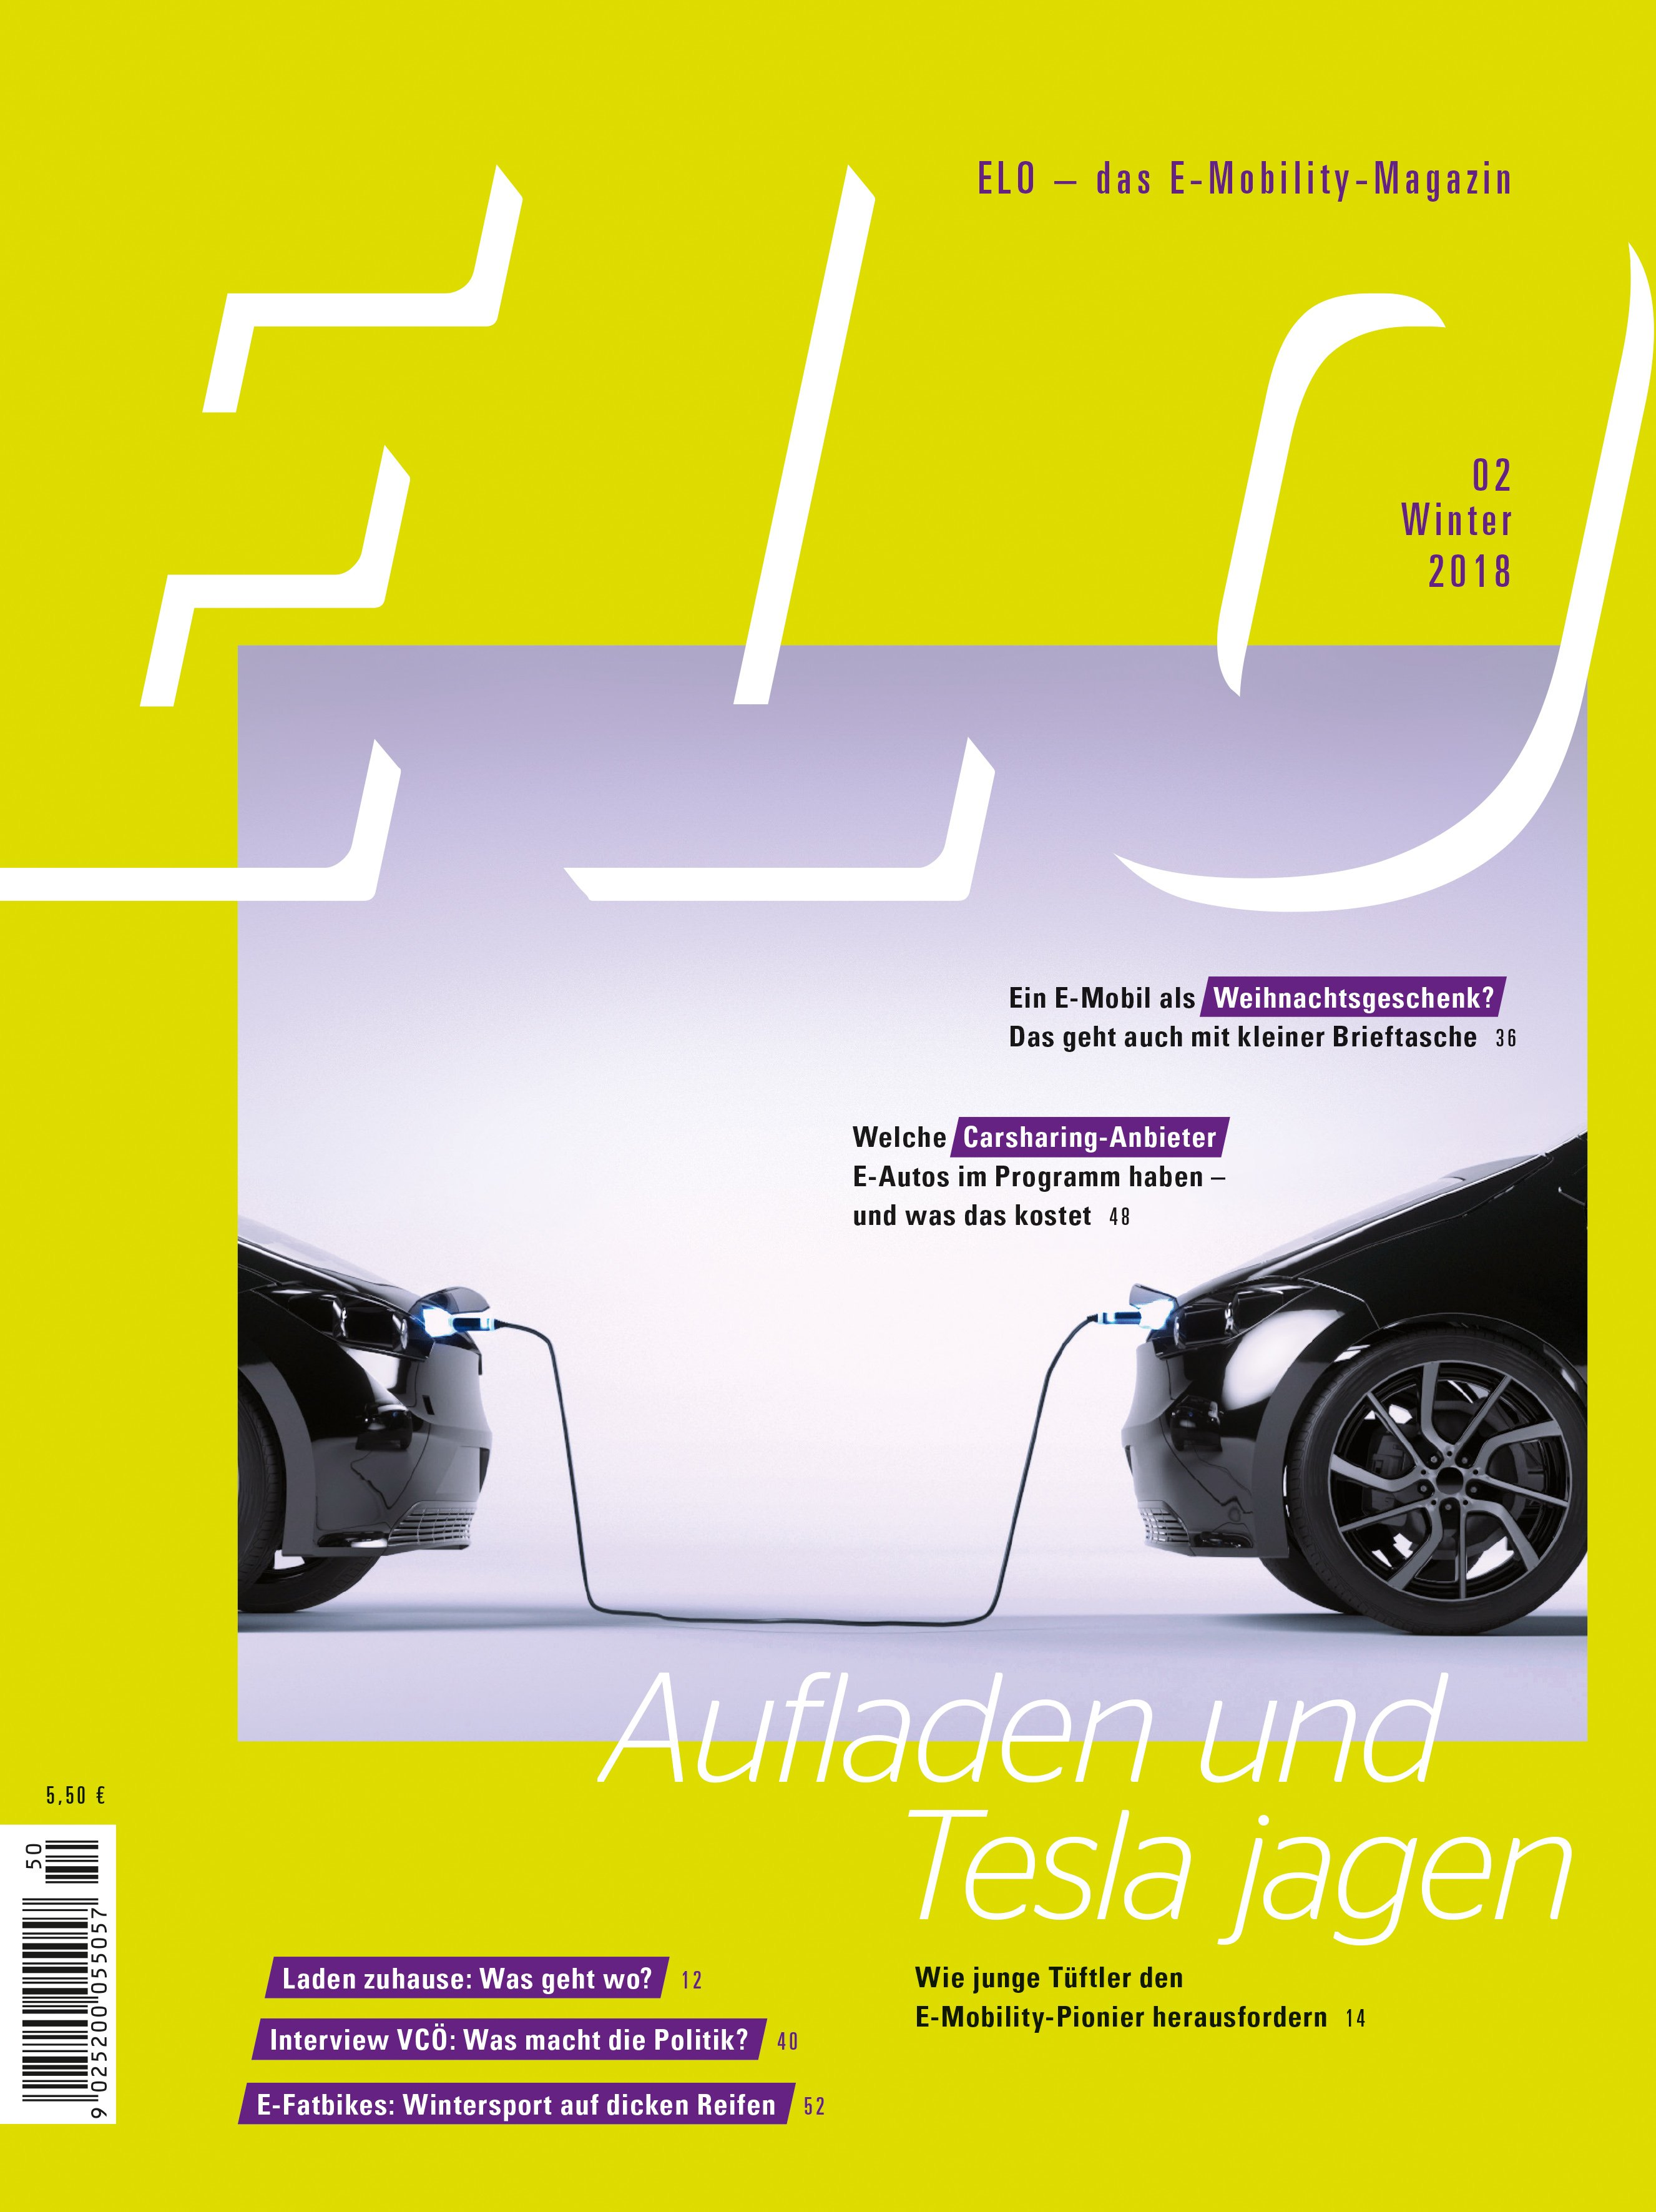 Comment of Thomas Raffeiner in ELO magazine